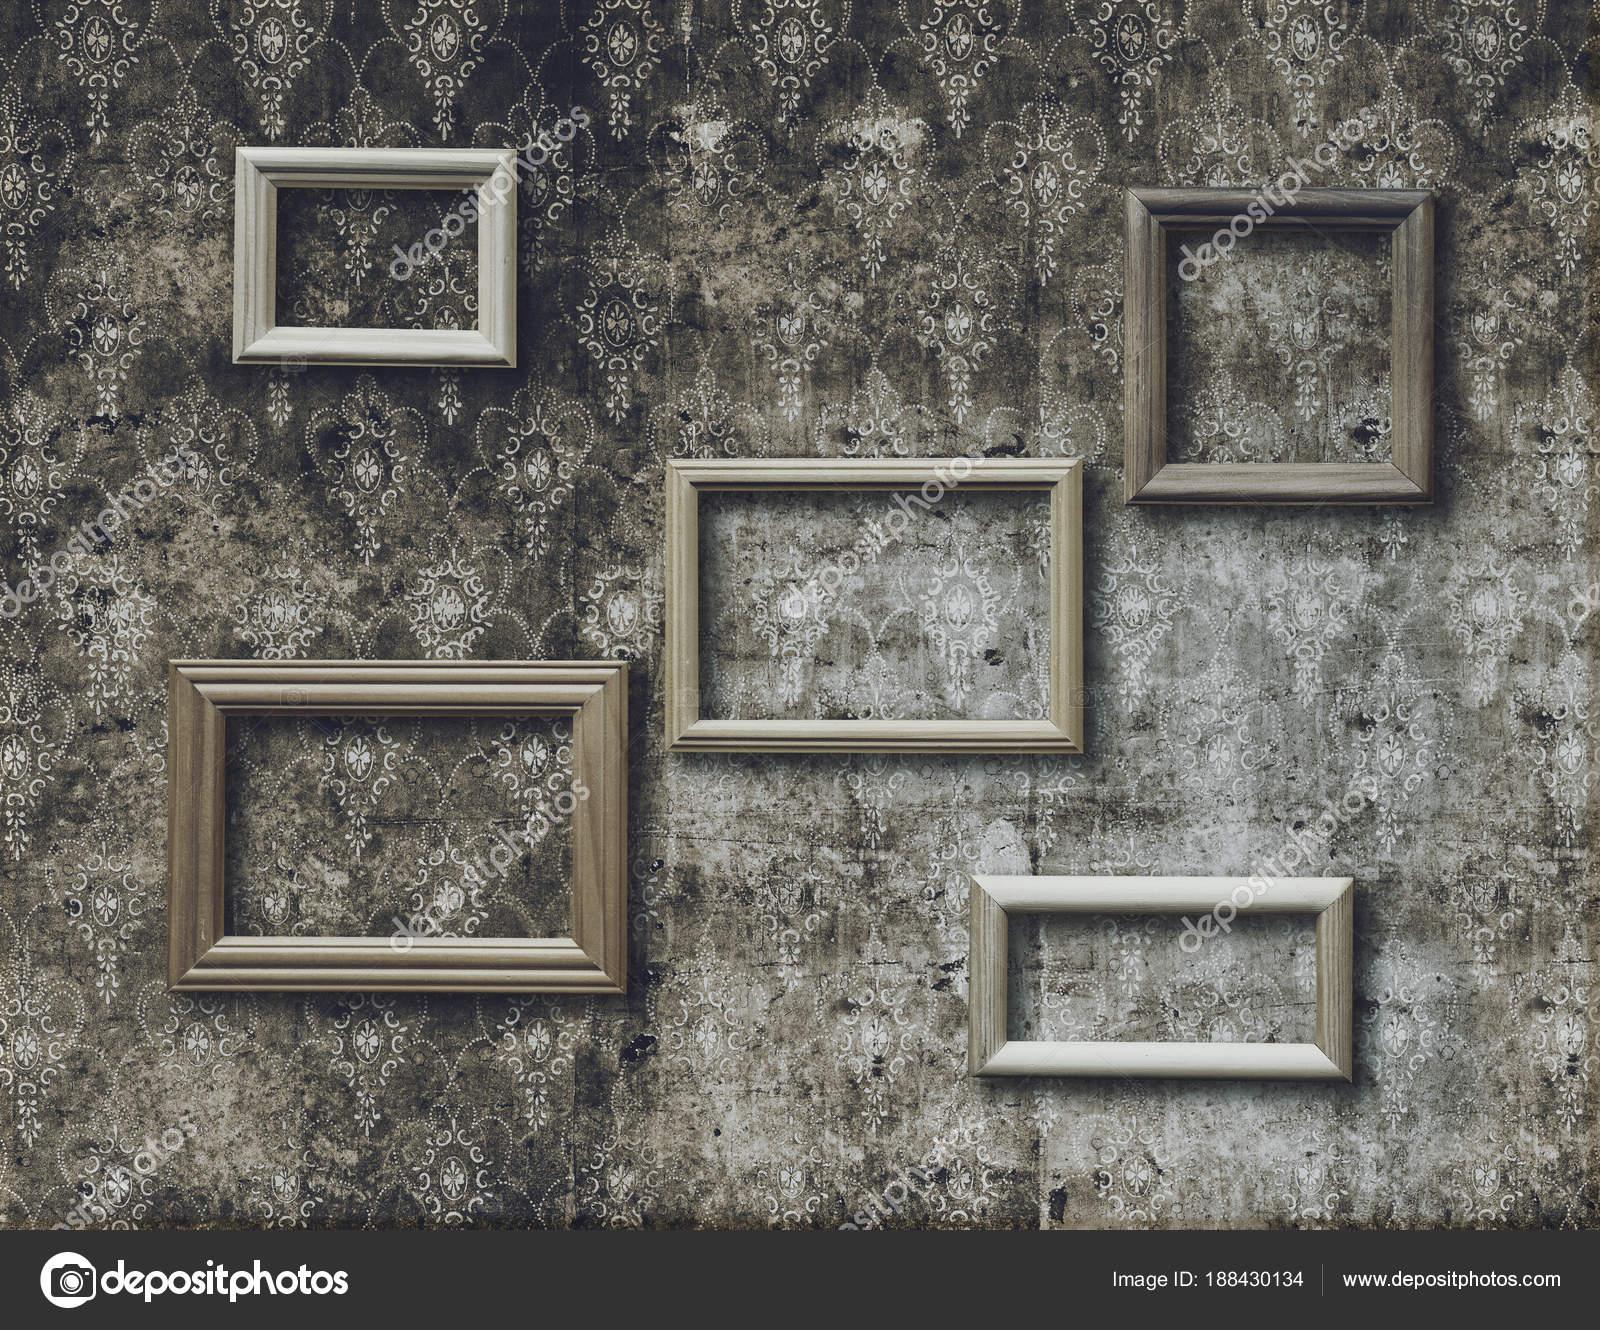 Vintage Bilderrahmen Auf Alten Retro Tapete — Stockfoto © avlntn ...